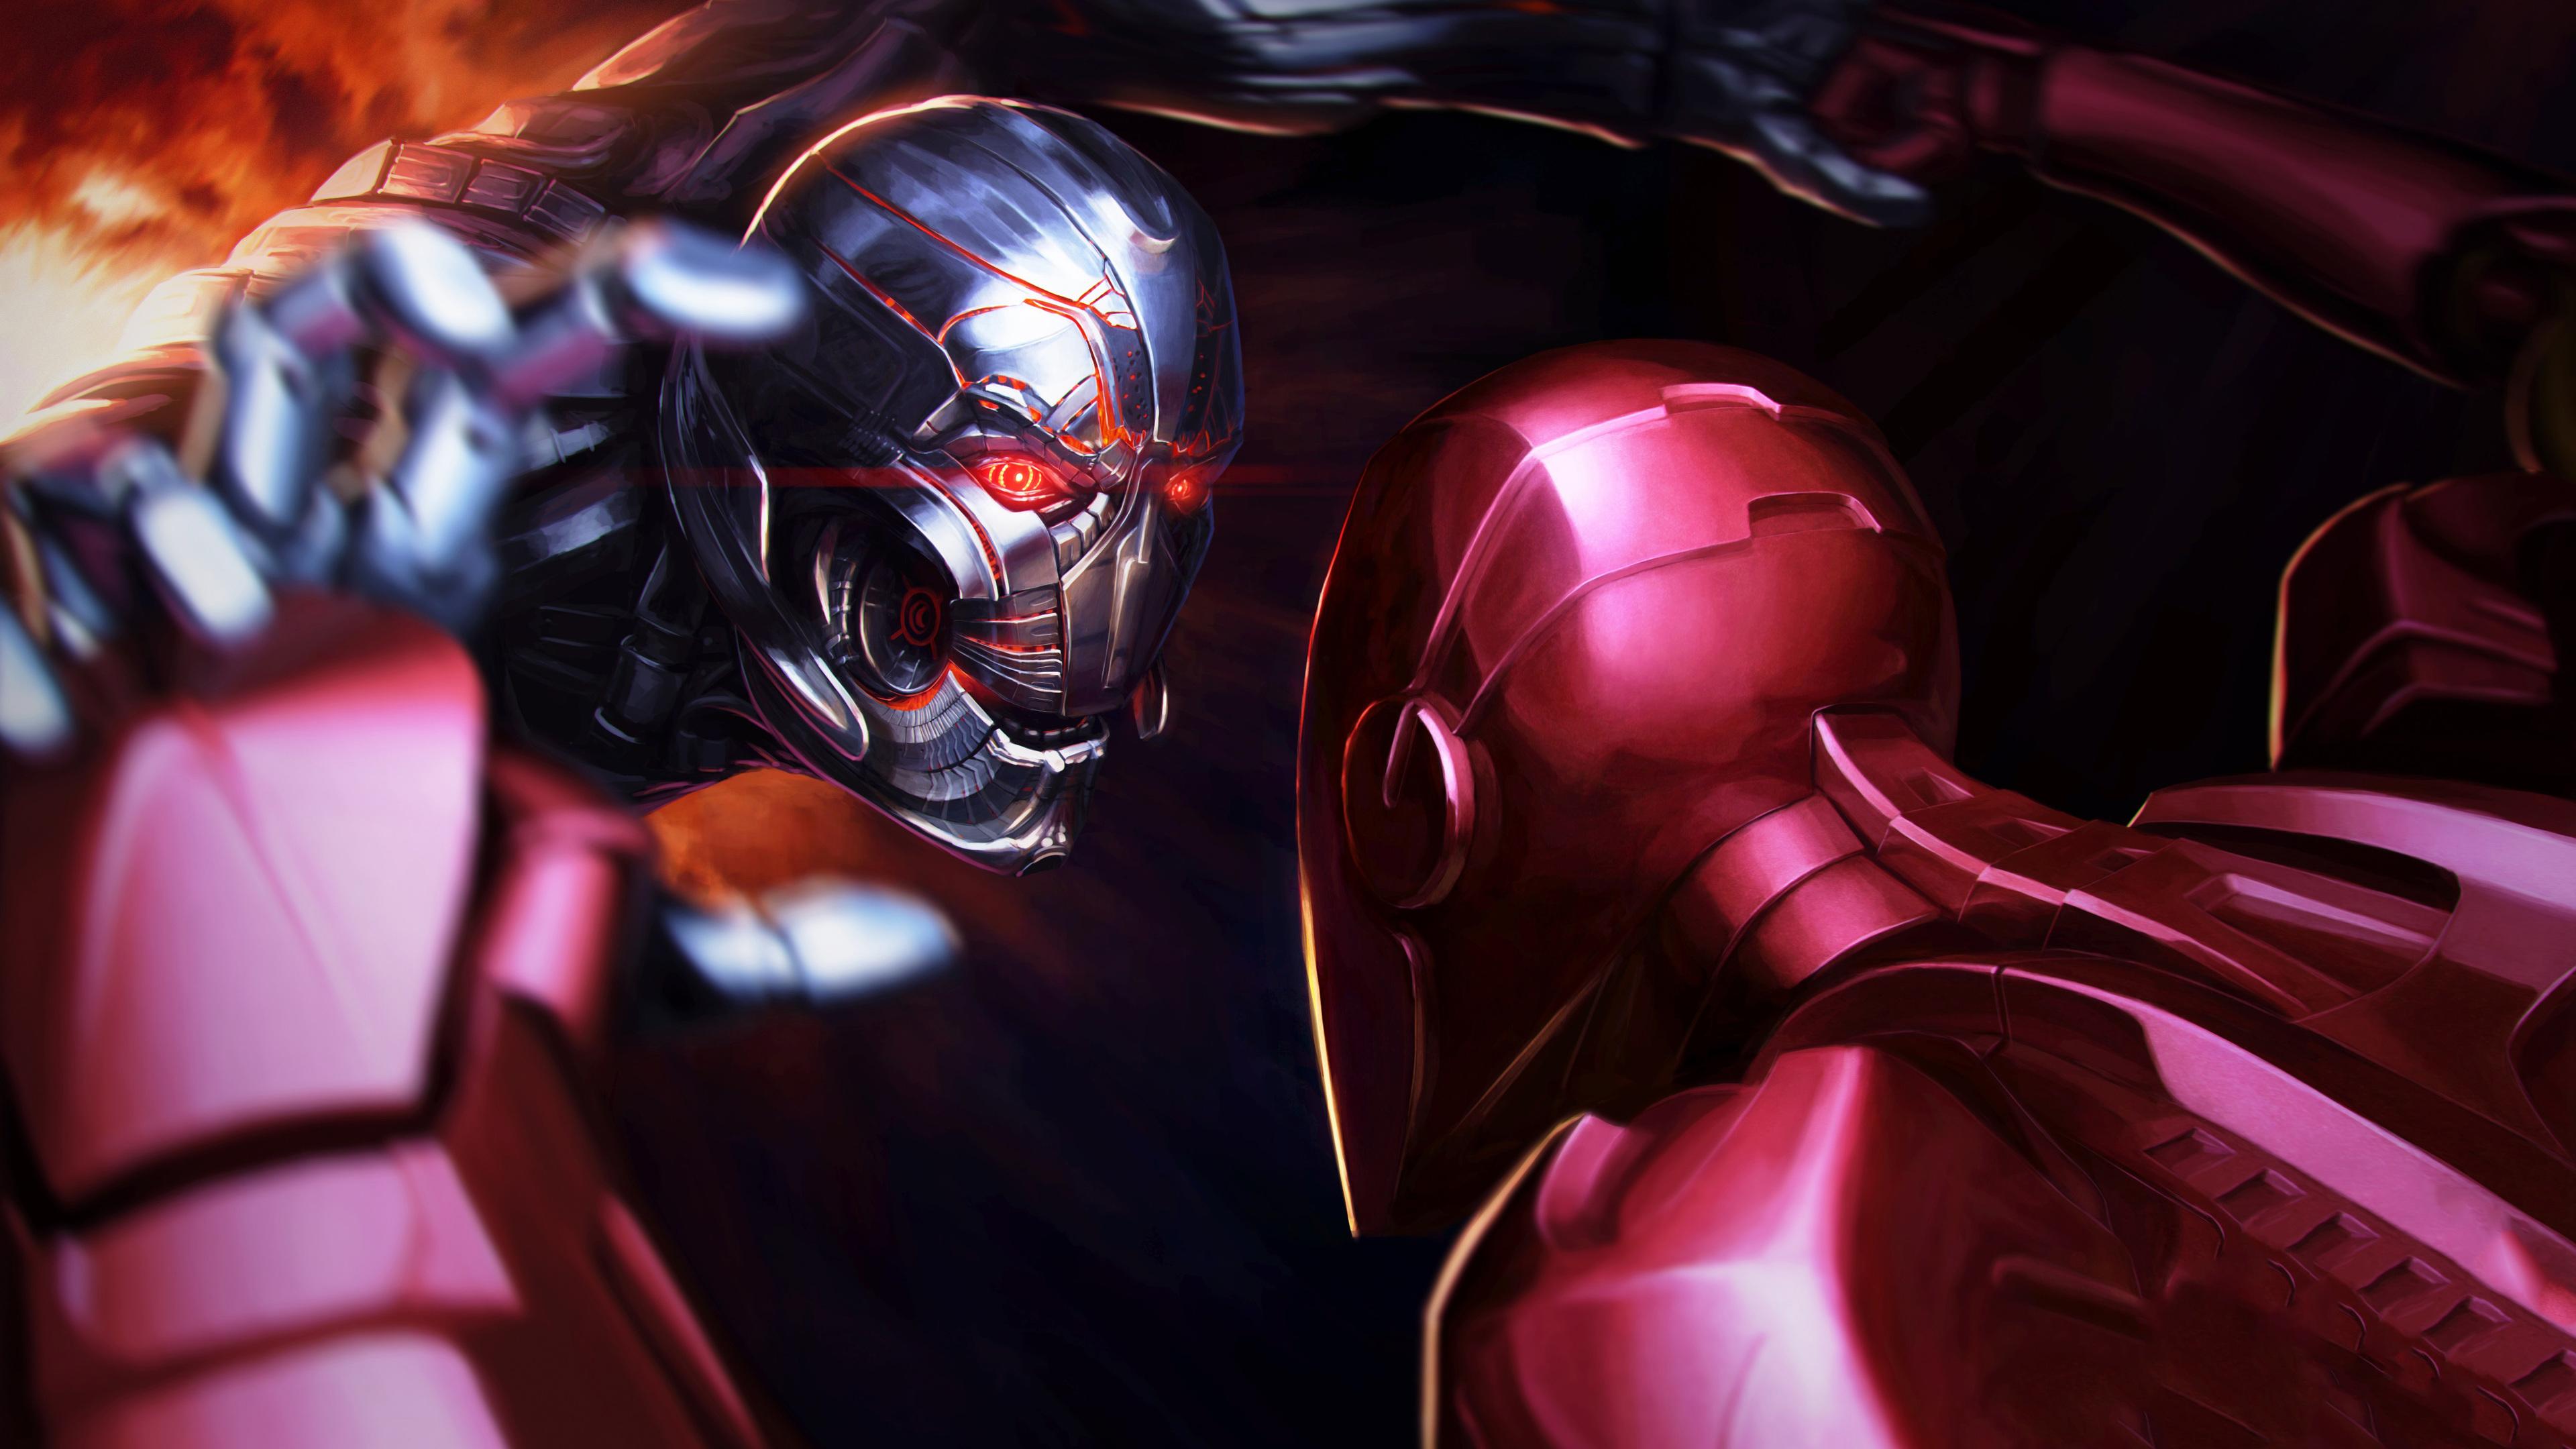 iron man vs thanos 1536522563 - Iron Man Vs Thanos - thanos-wallpapers, superheroes wallpapers, iron man wallpapers, hd-wallpapers, digital art wallpapers, artwork wallpapers, 5k wallpapers, 4k-wallpapers